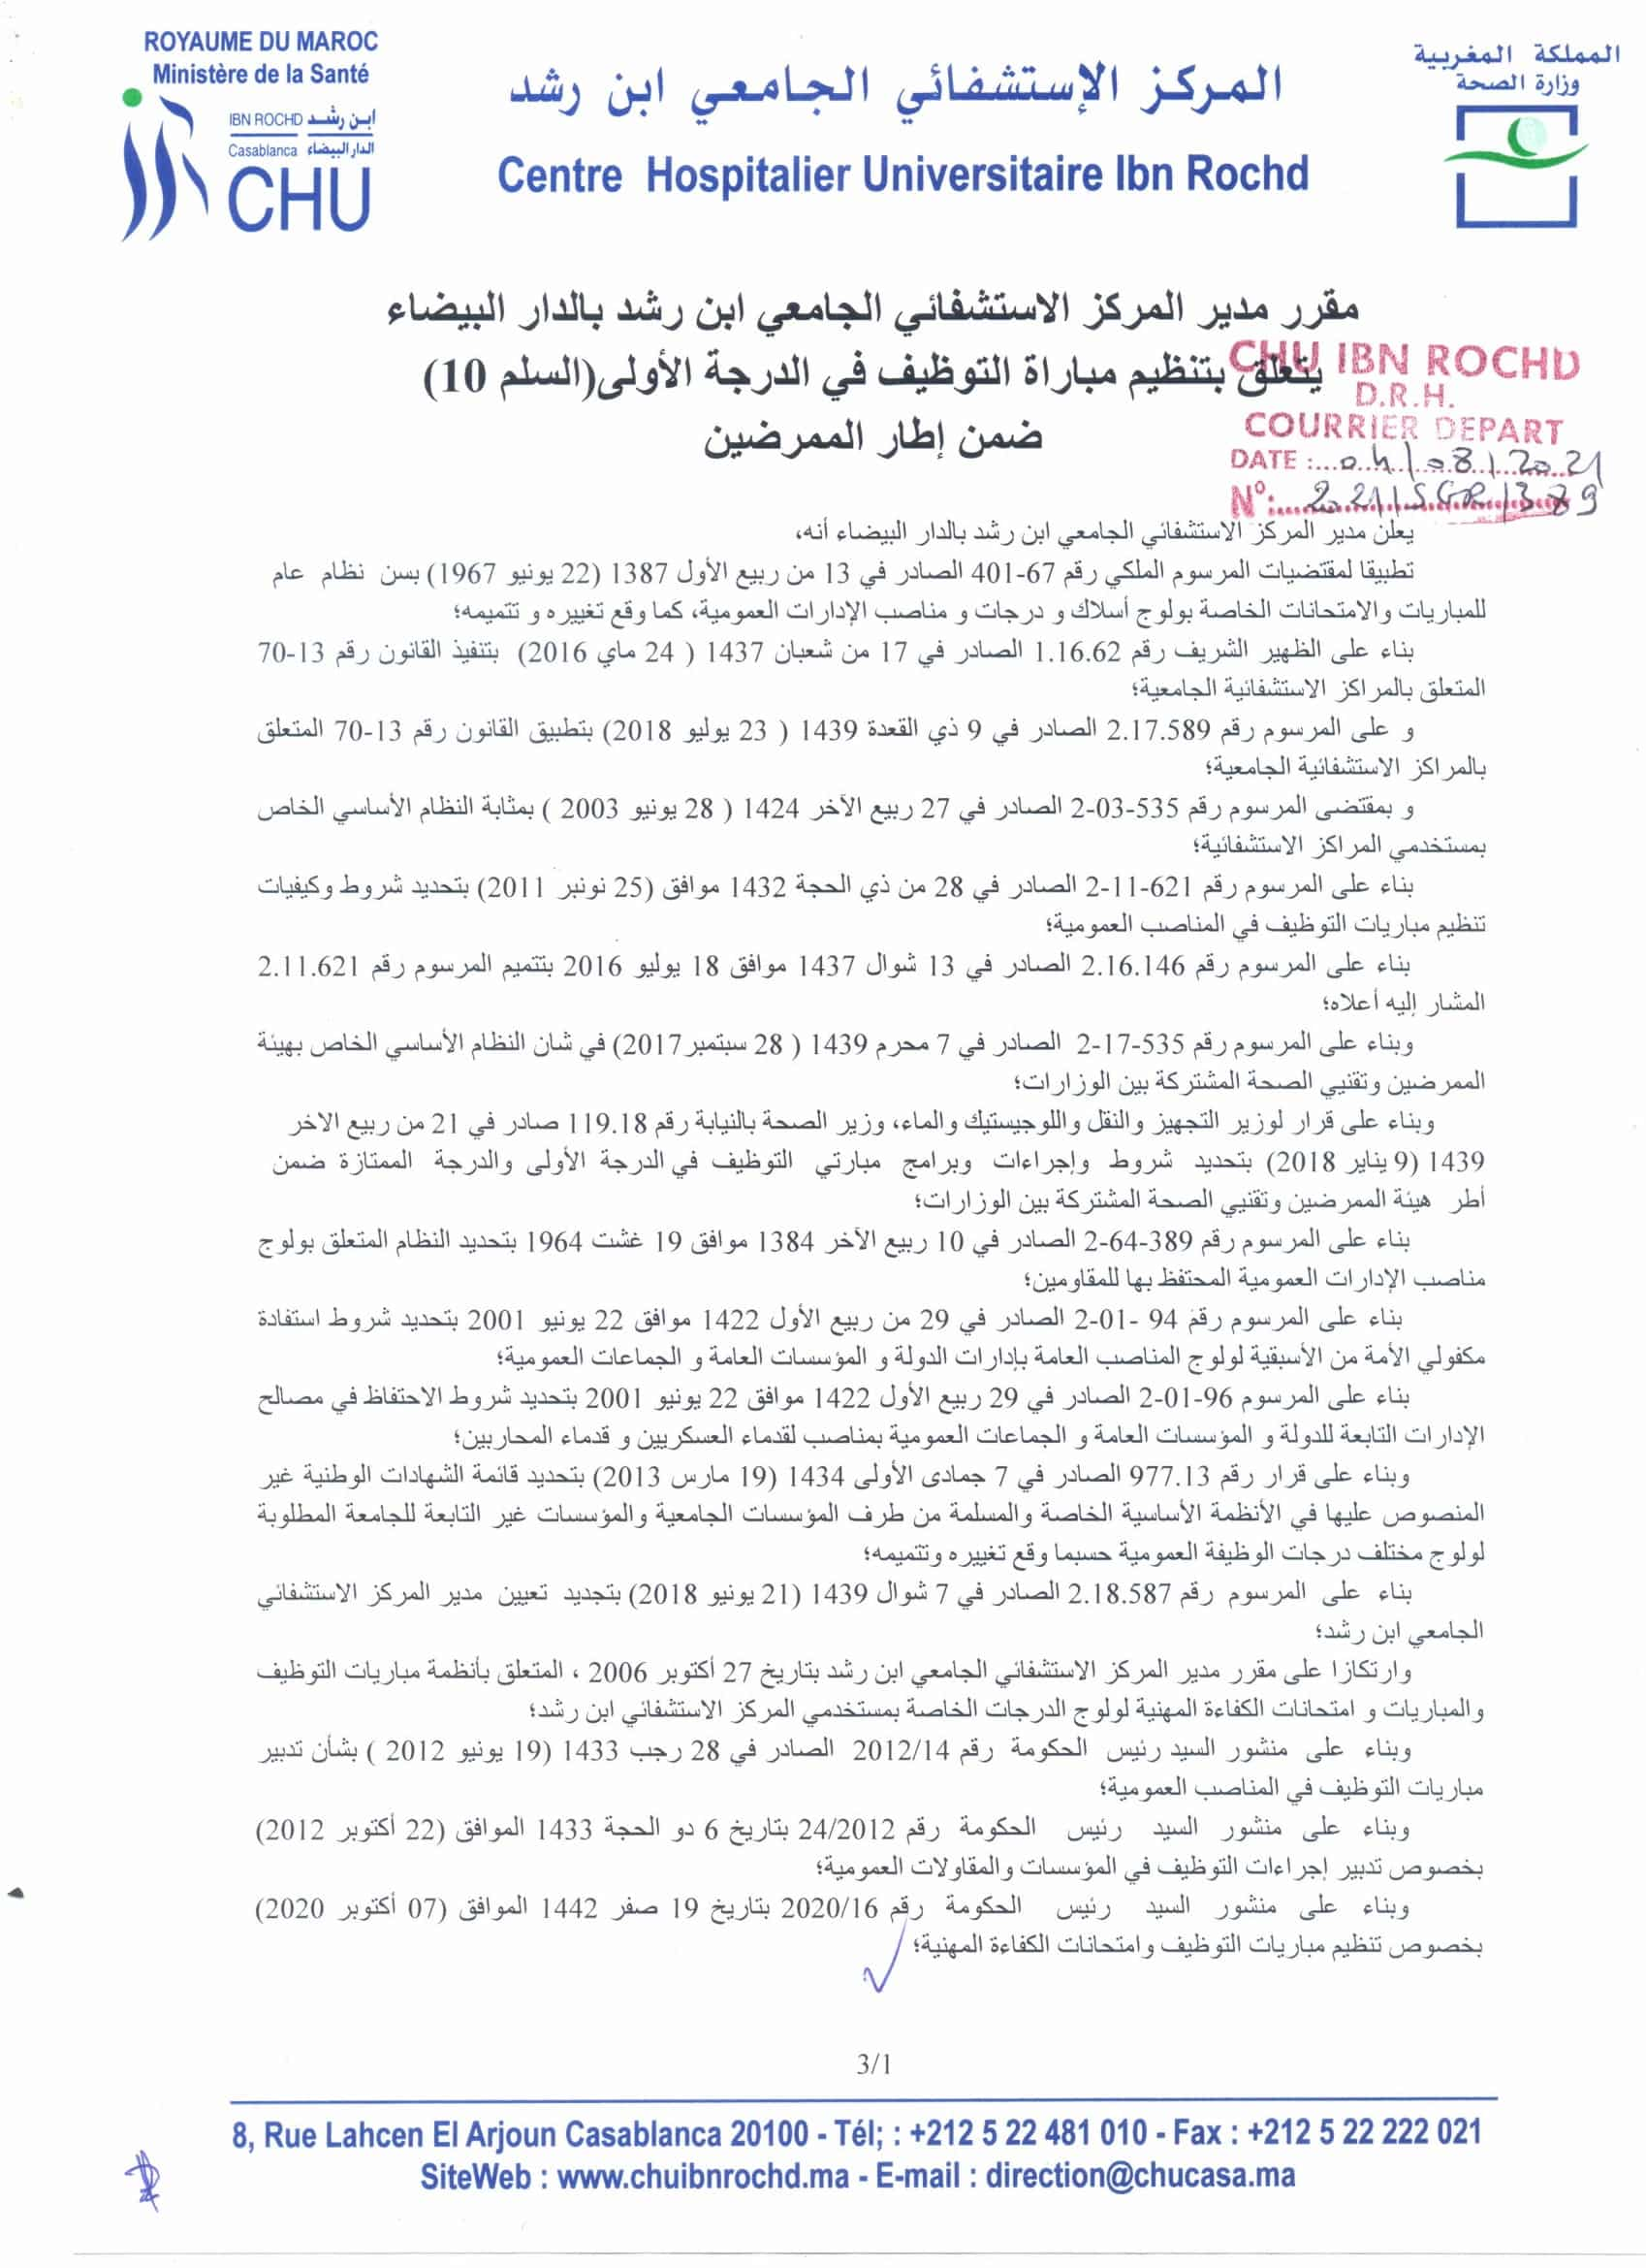 RECRUTINF1992021 1 Concours de Recrutement CHU Ibn Rochd 2021 (156 Postes)